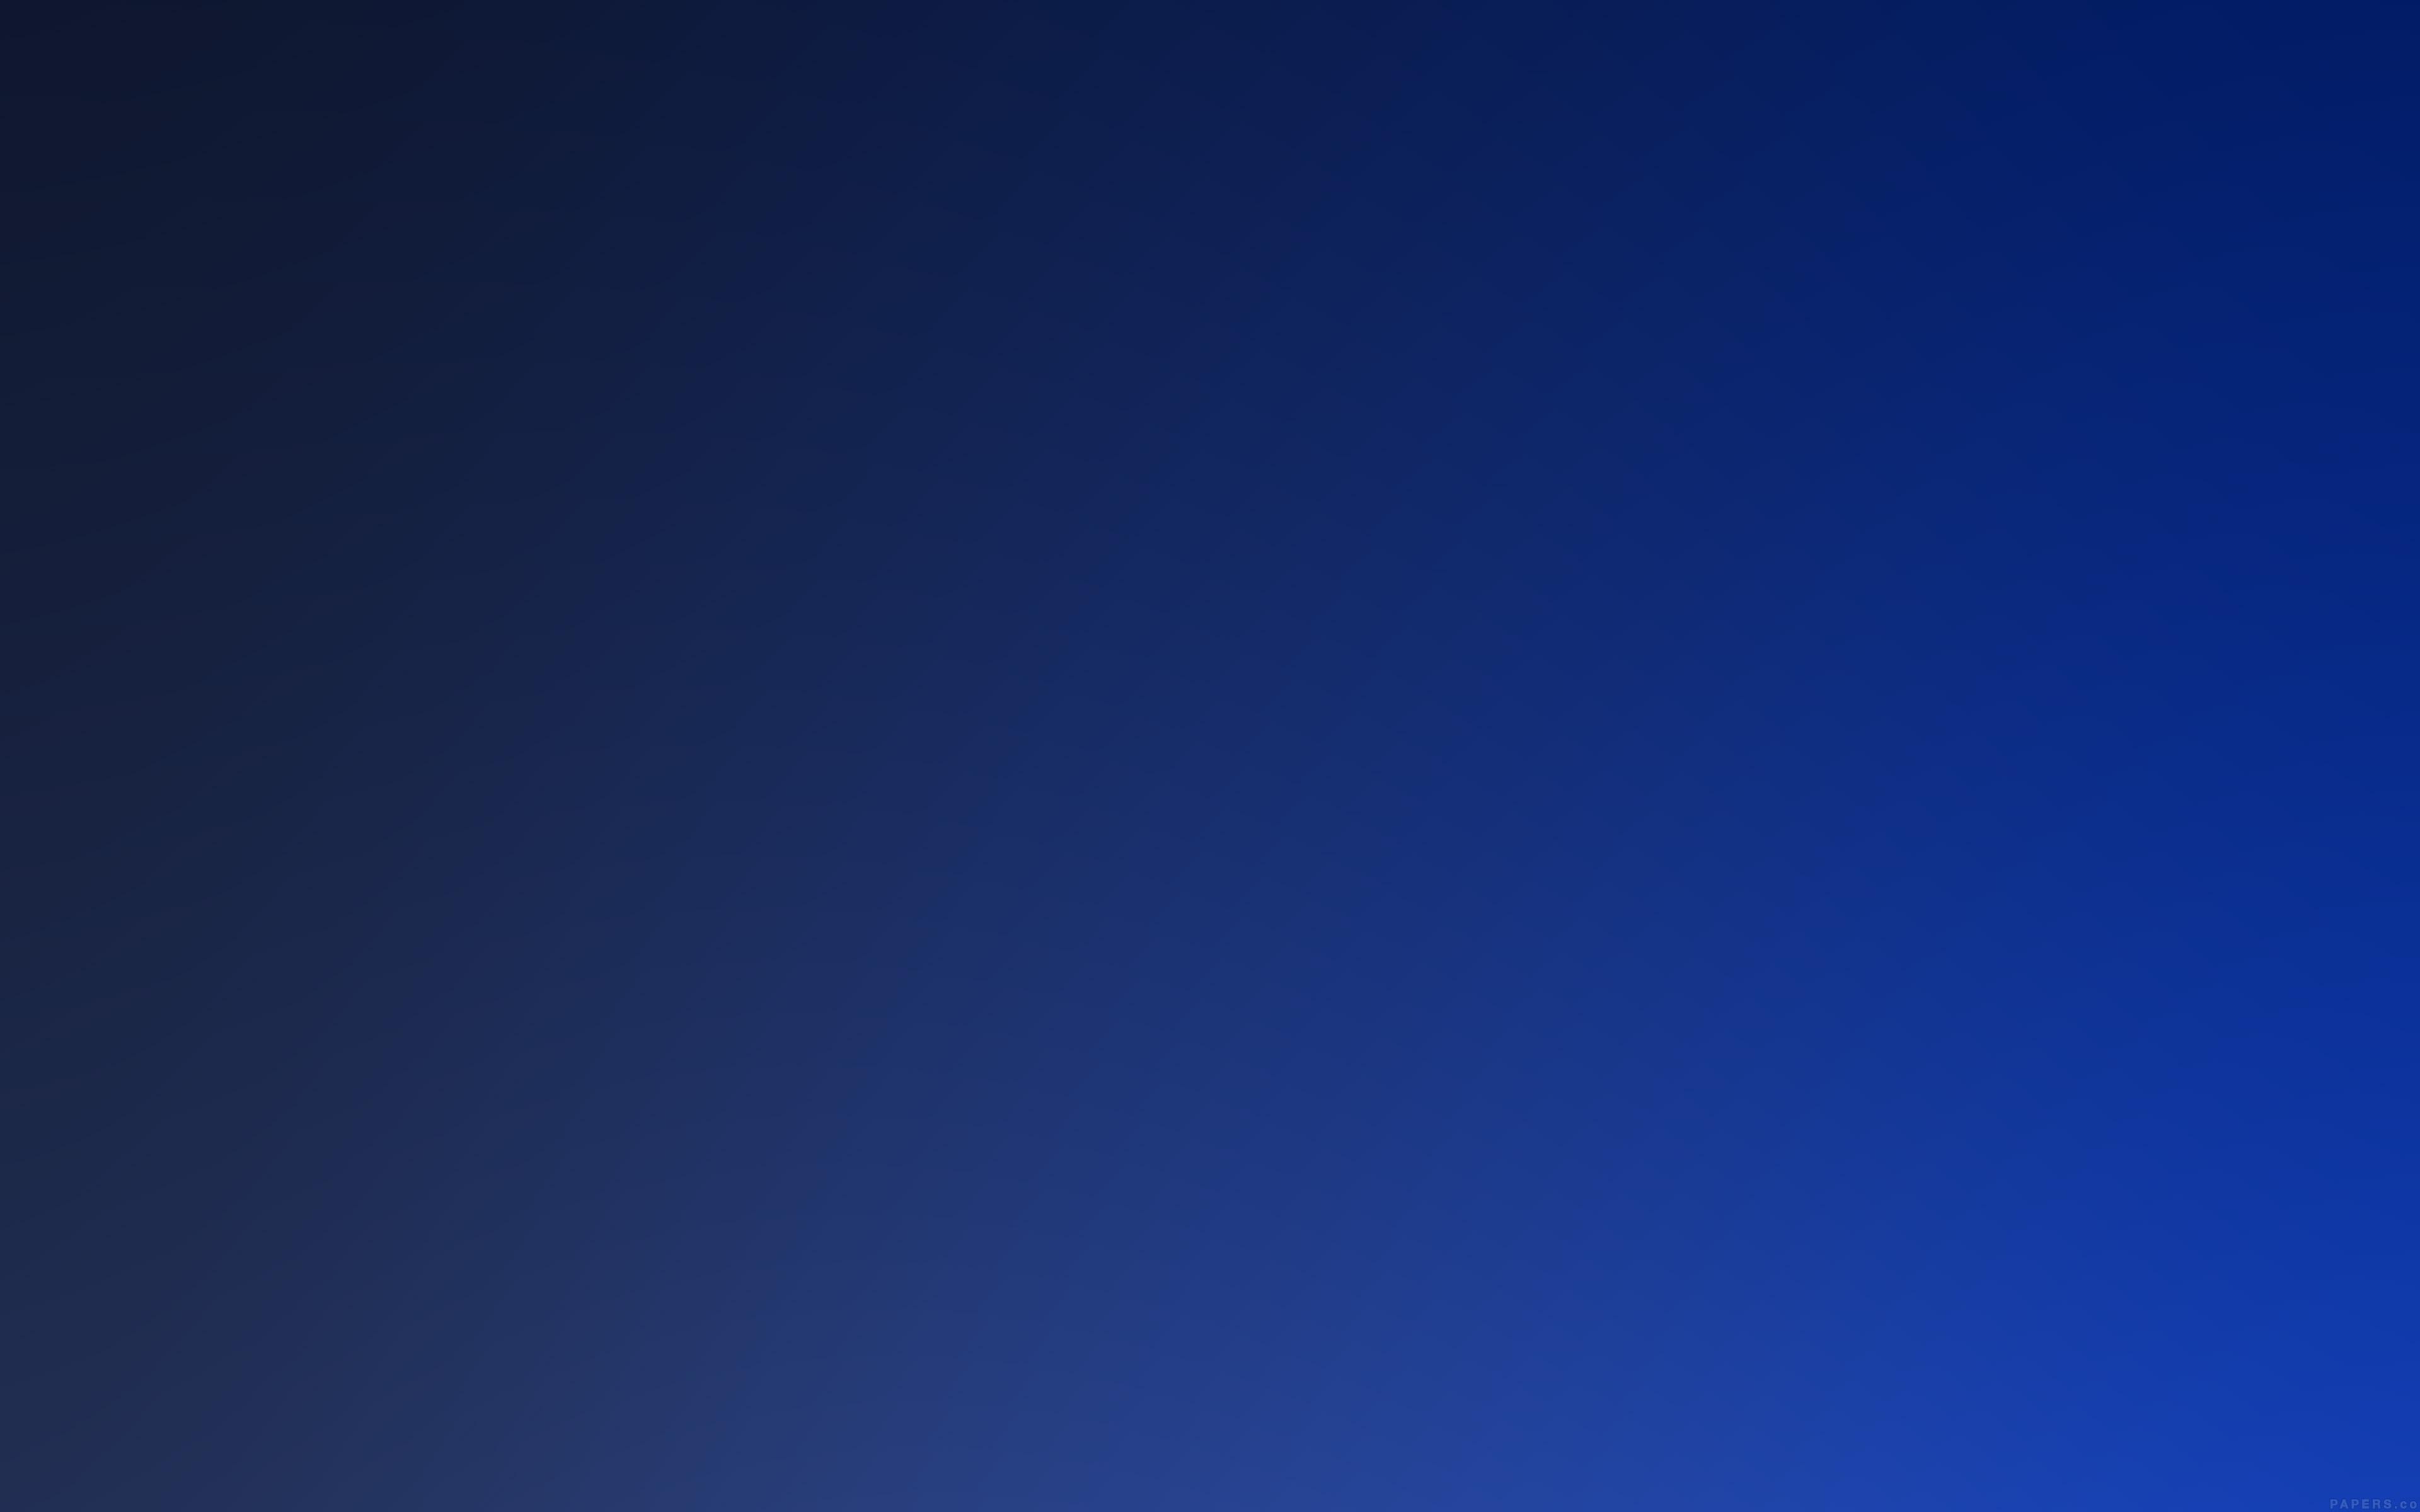 Sf03 Dark Blue Ocean Gradation Blur Papers Co